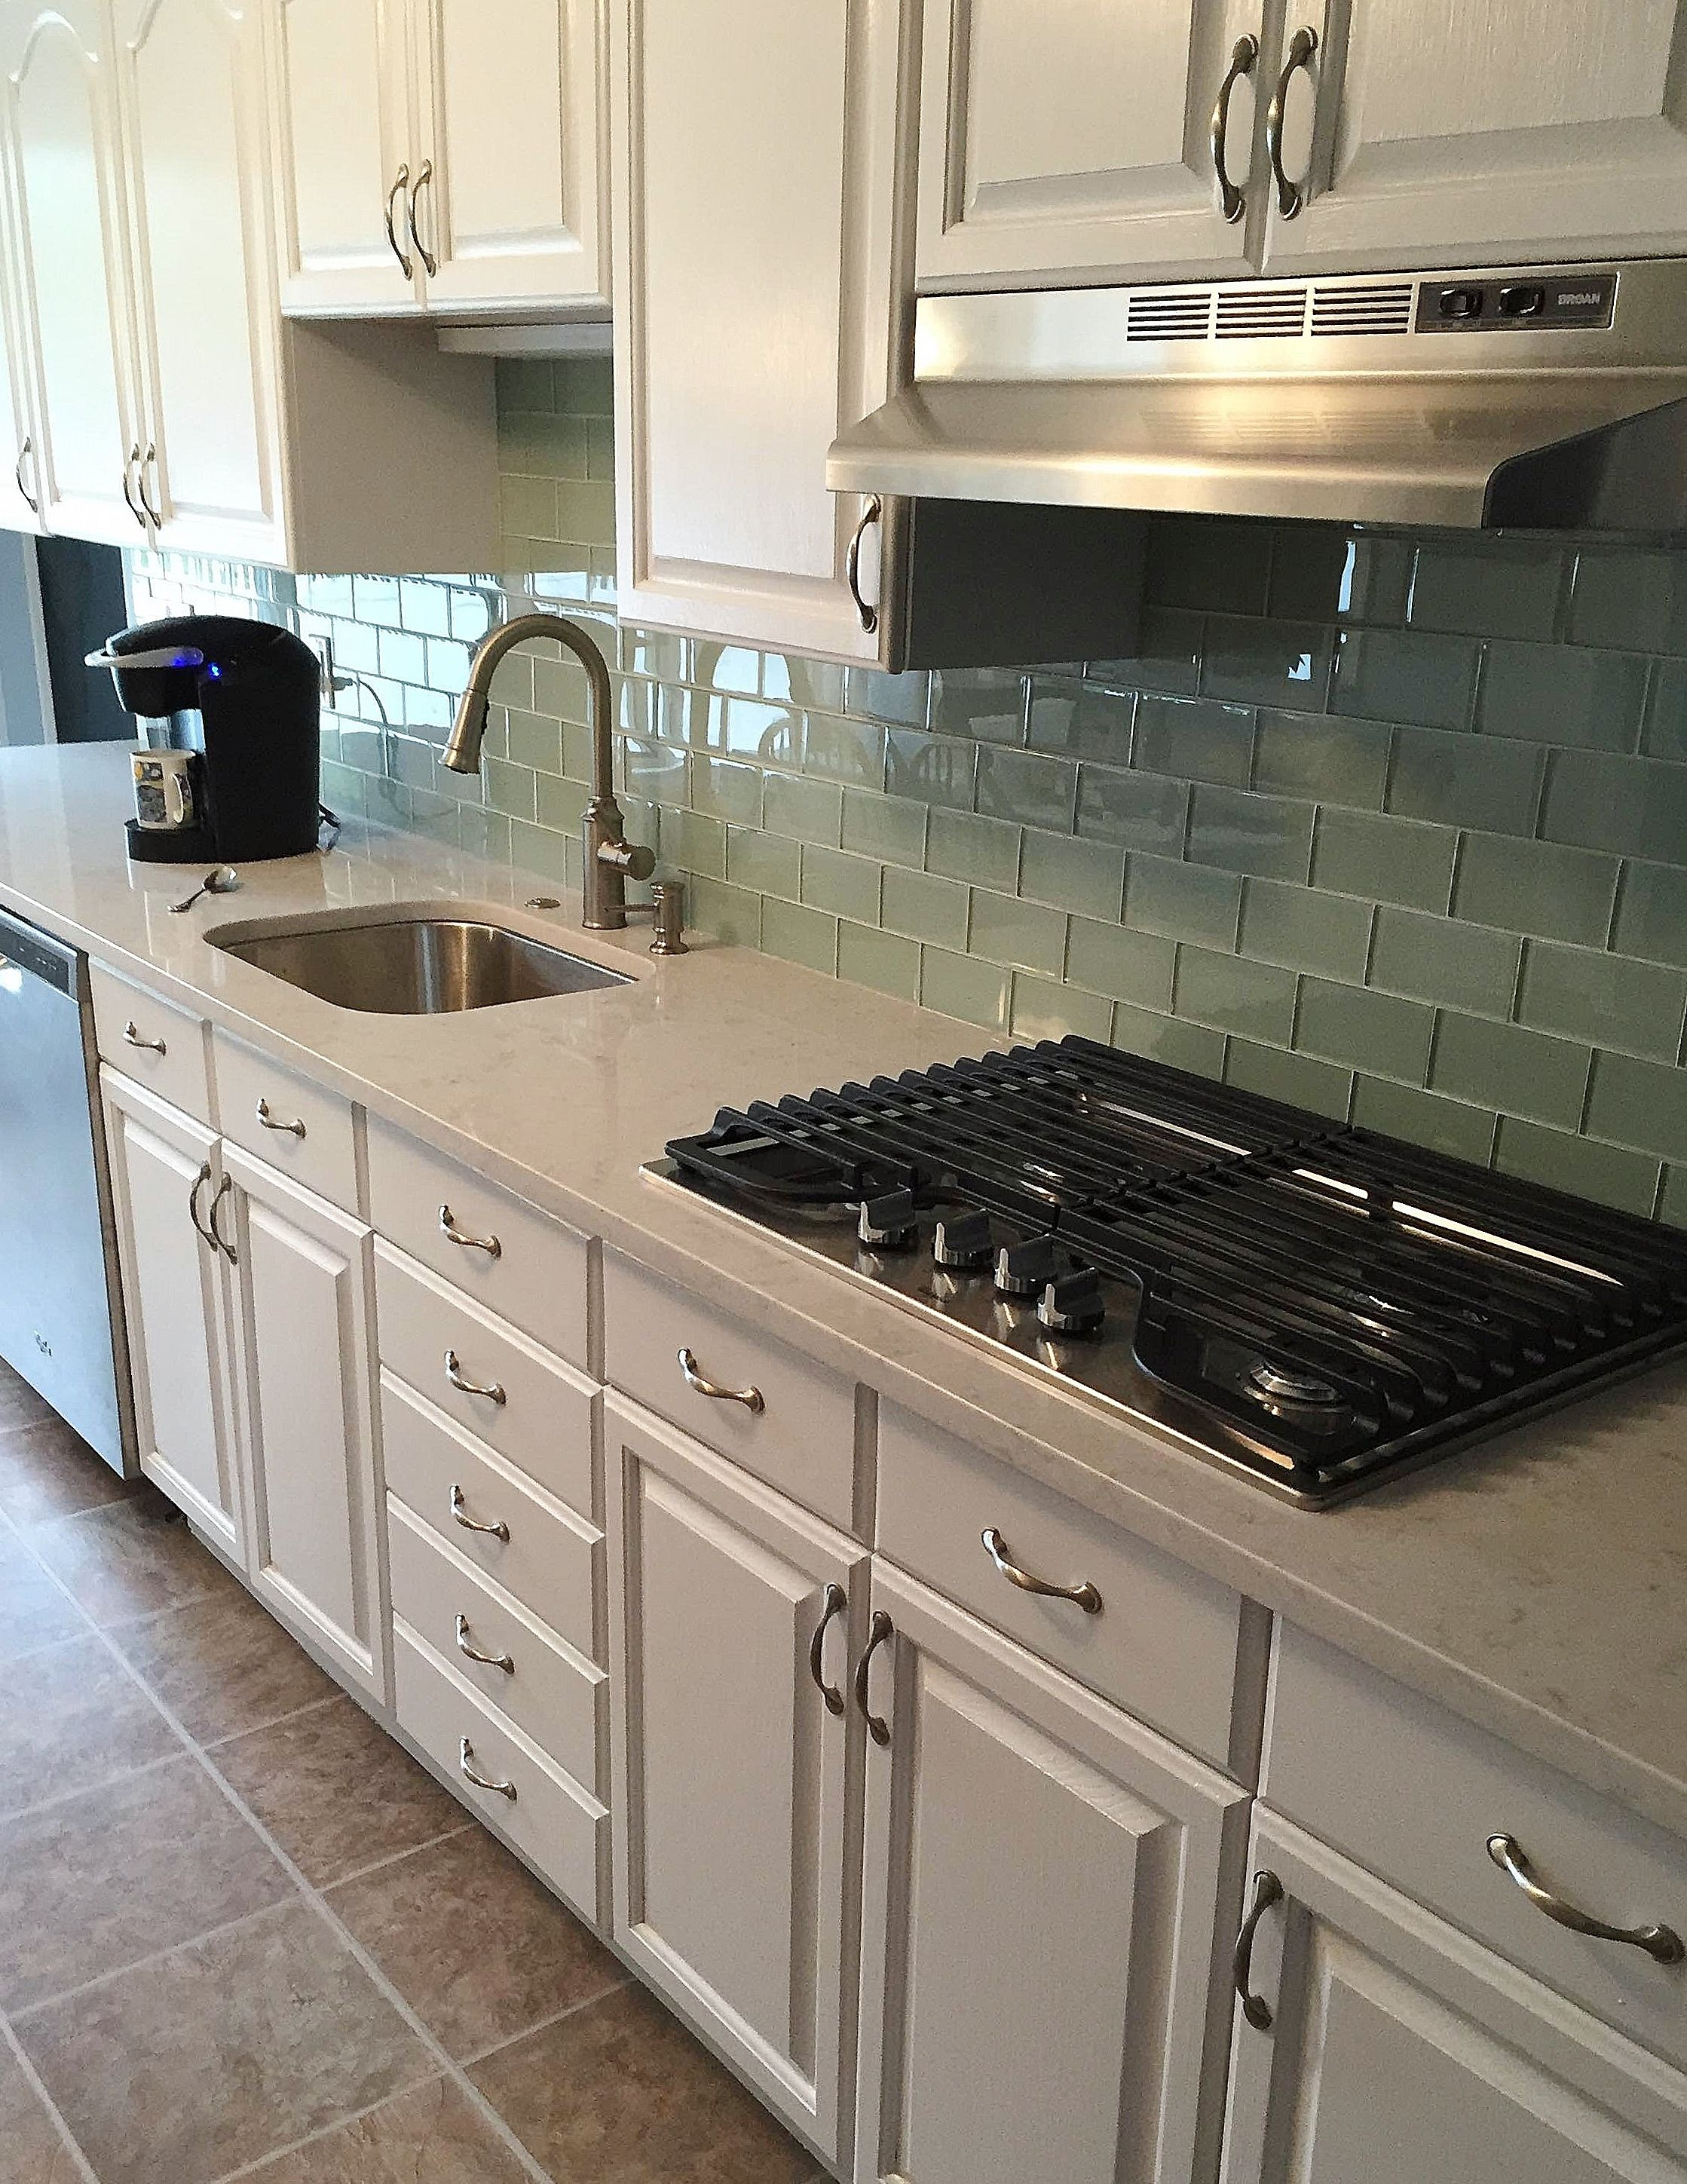 glass tile kitchen countertop armoire silestone lagoon quartz countertops with a soft blue